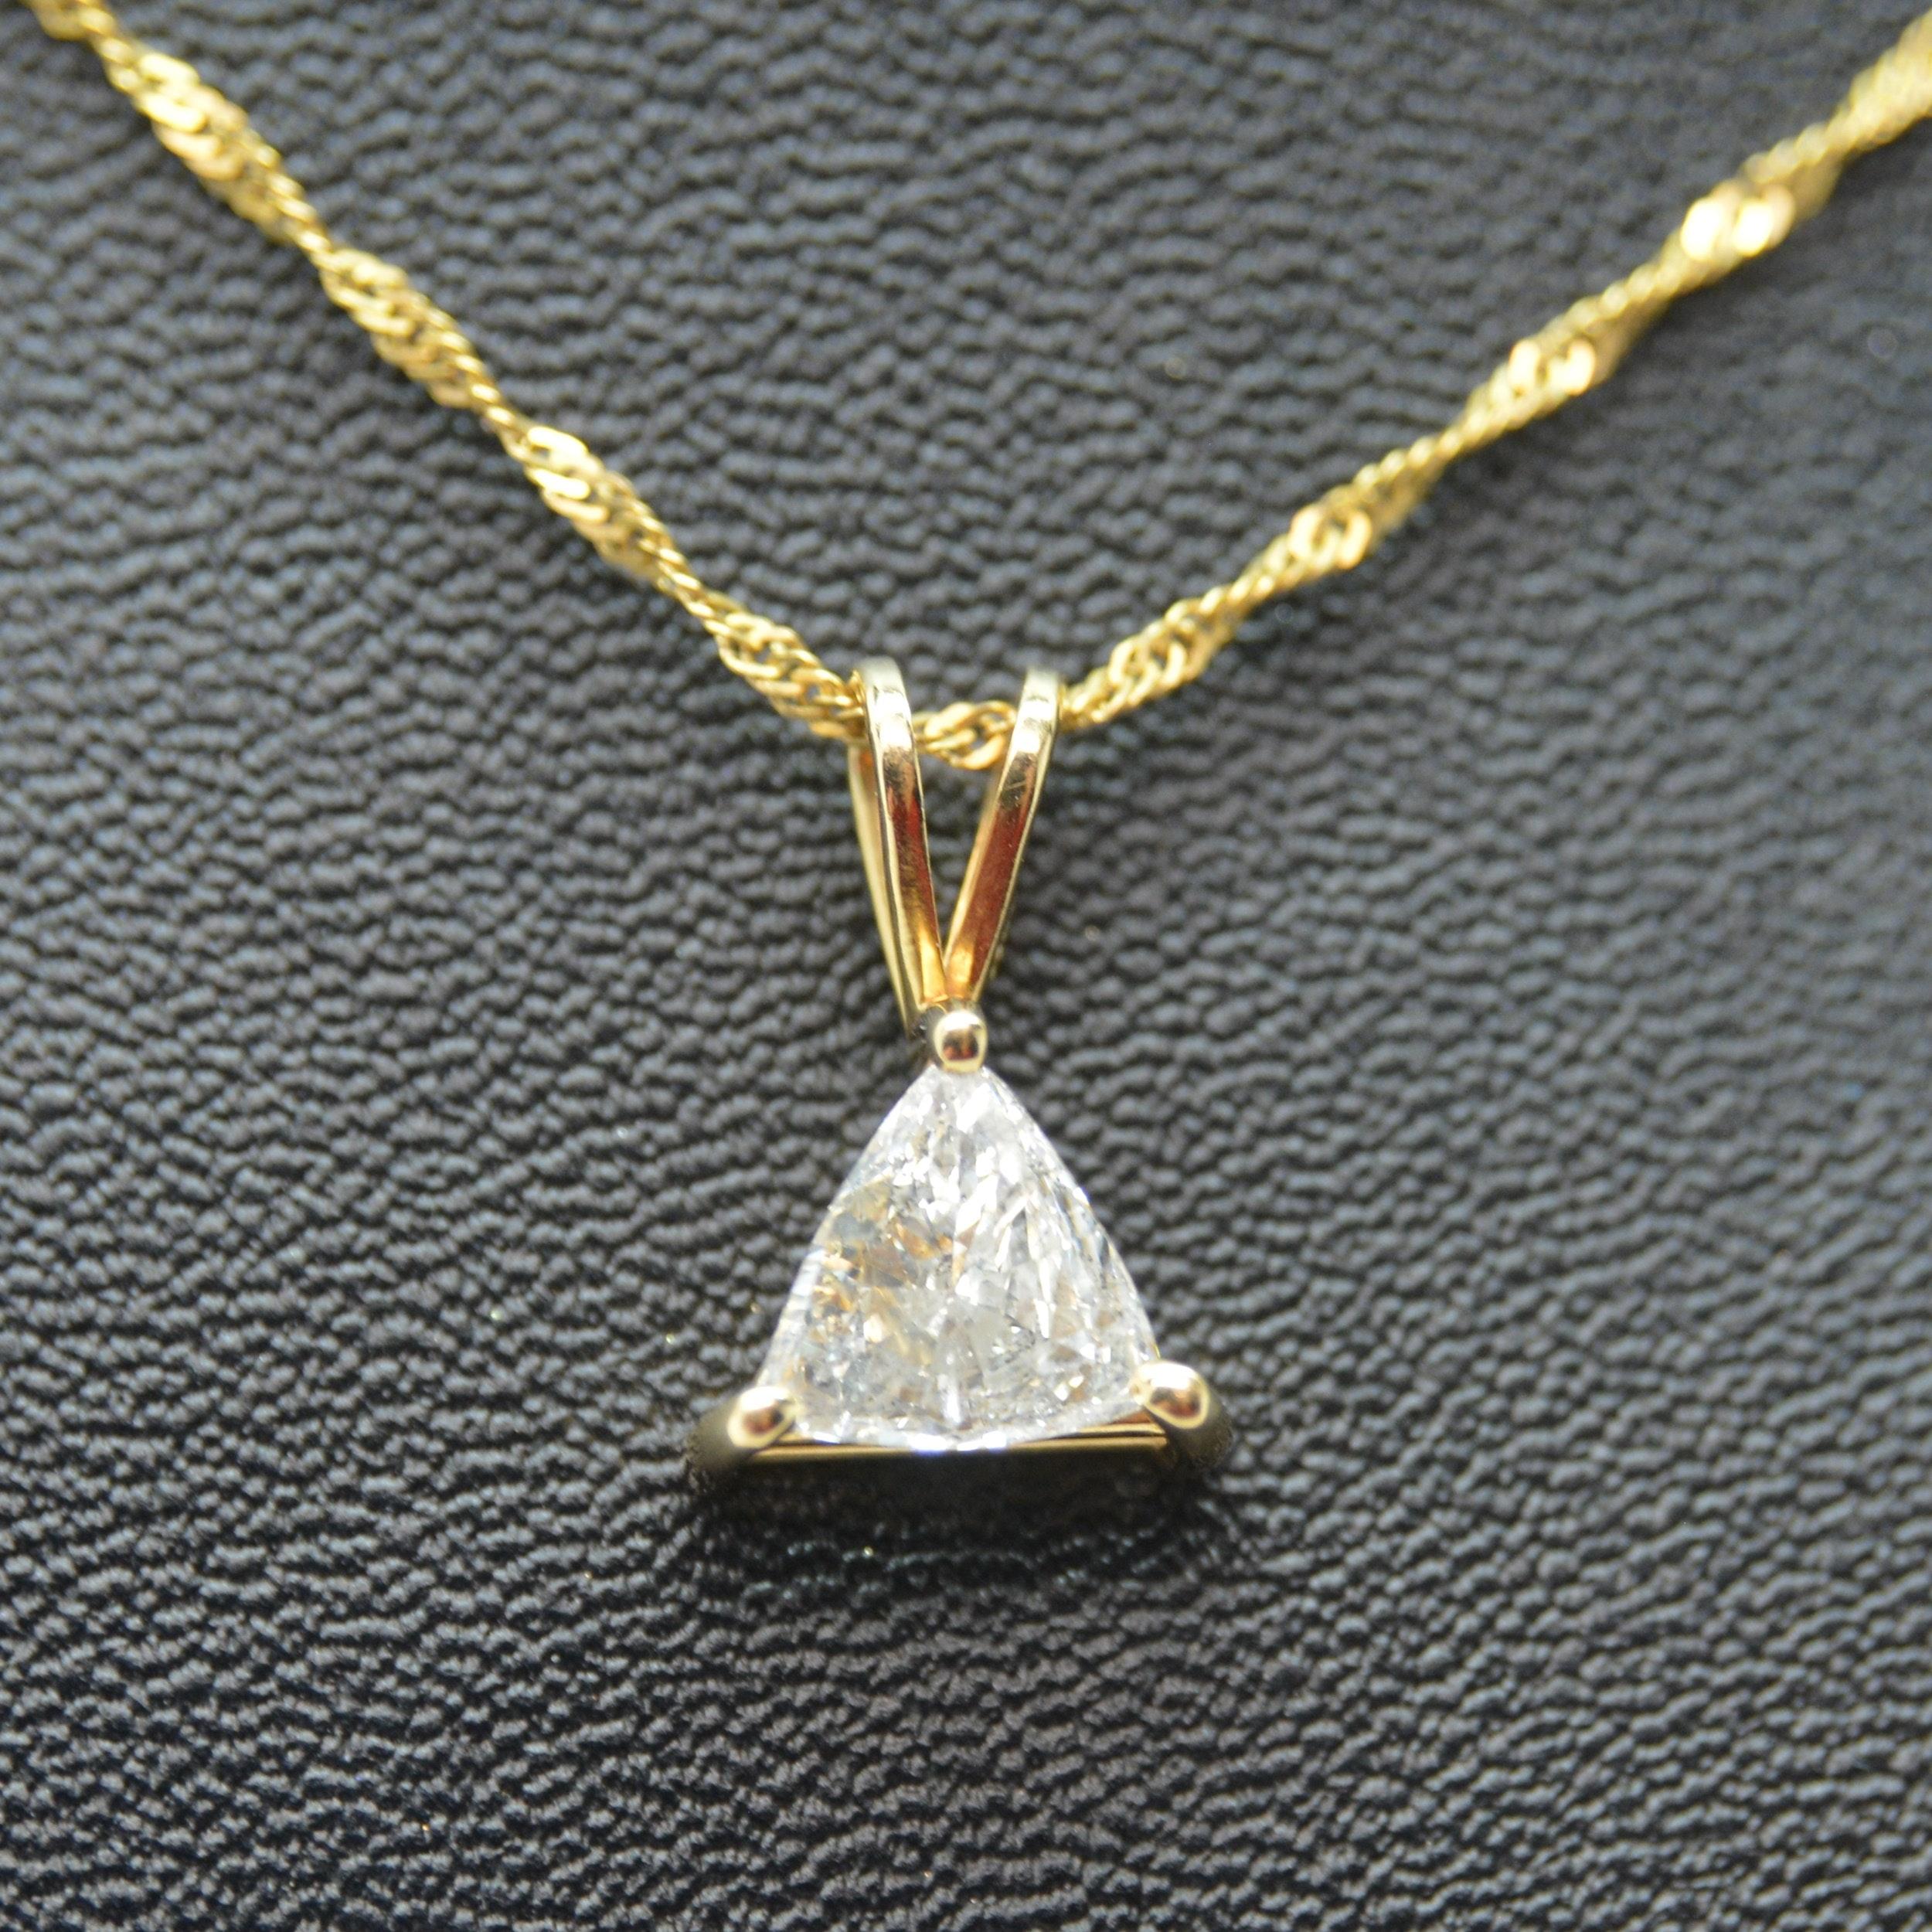 14K Yellow Gold 0.58 CT Trillion Diamond Pendant Necklace